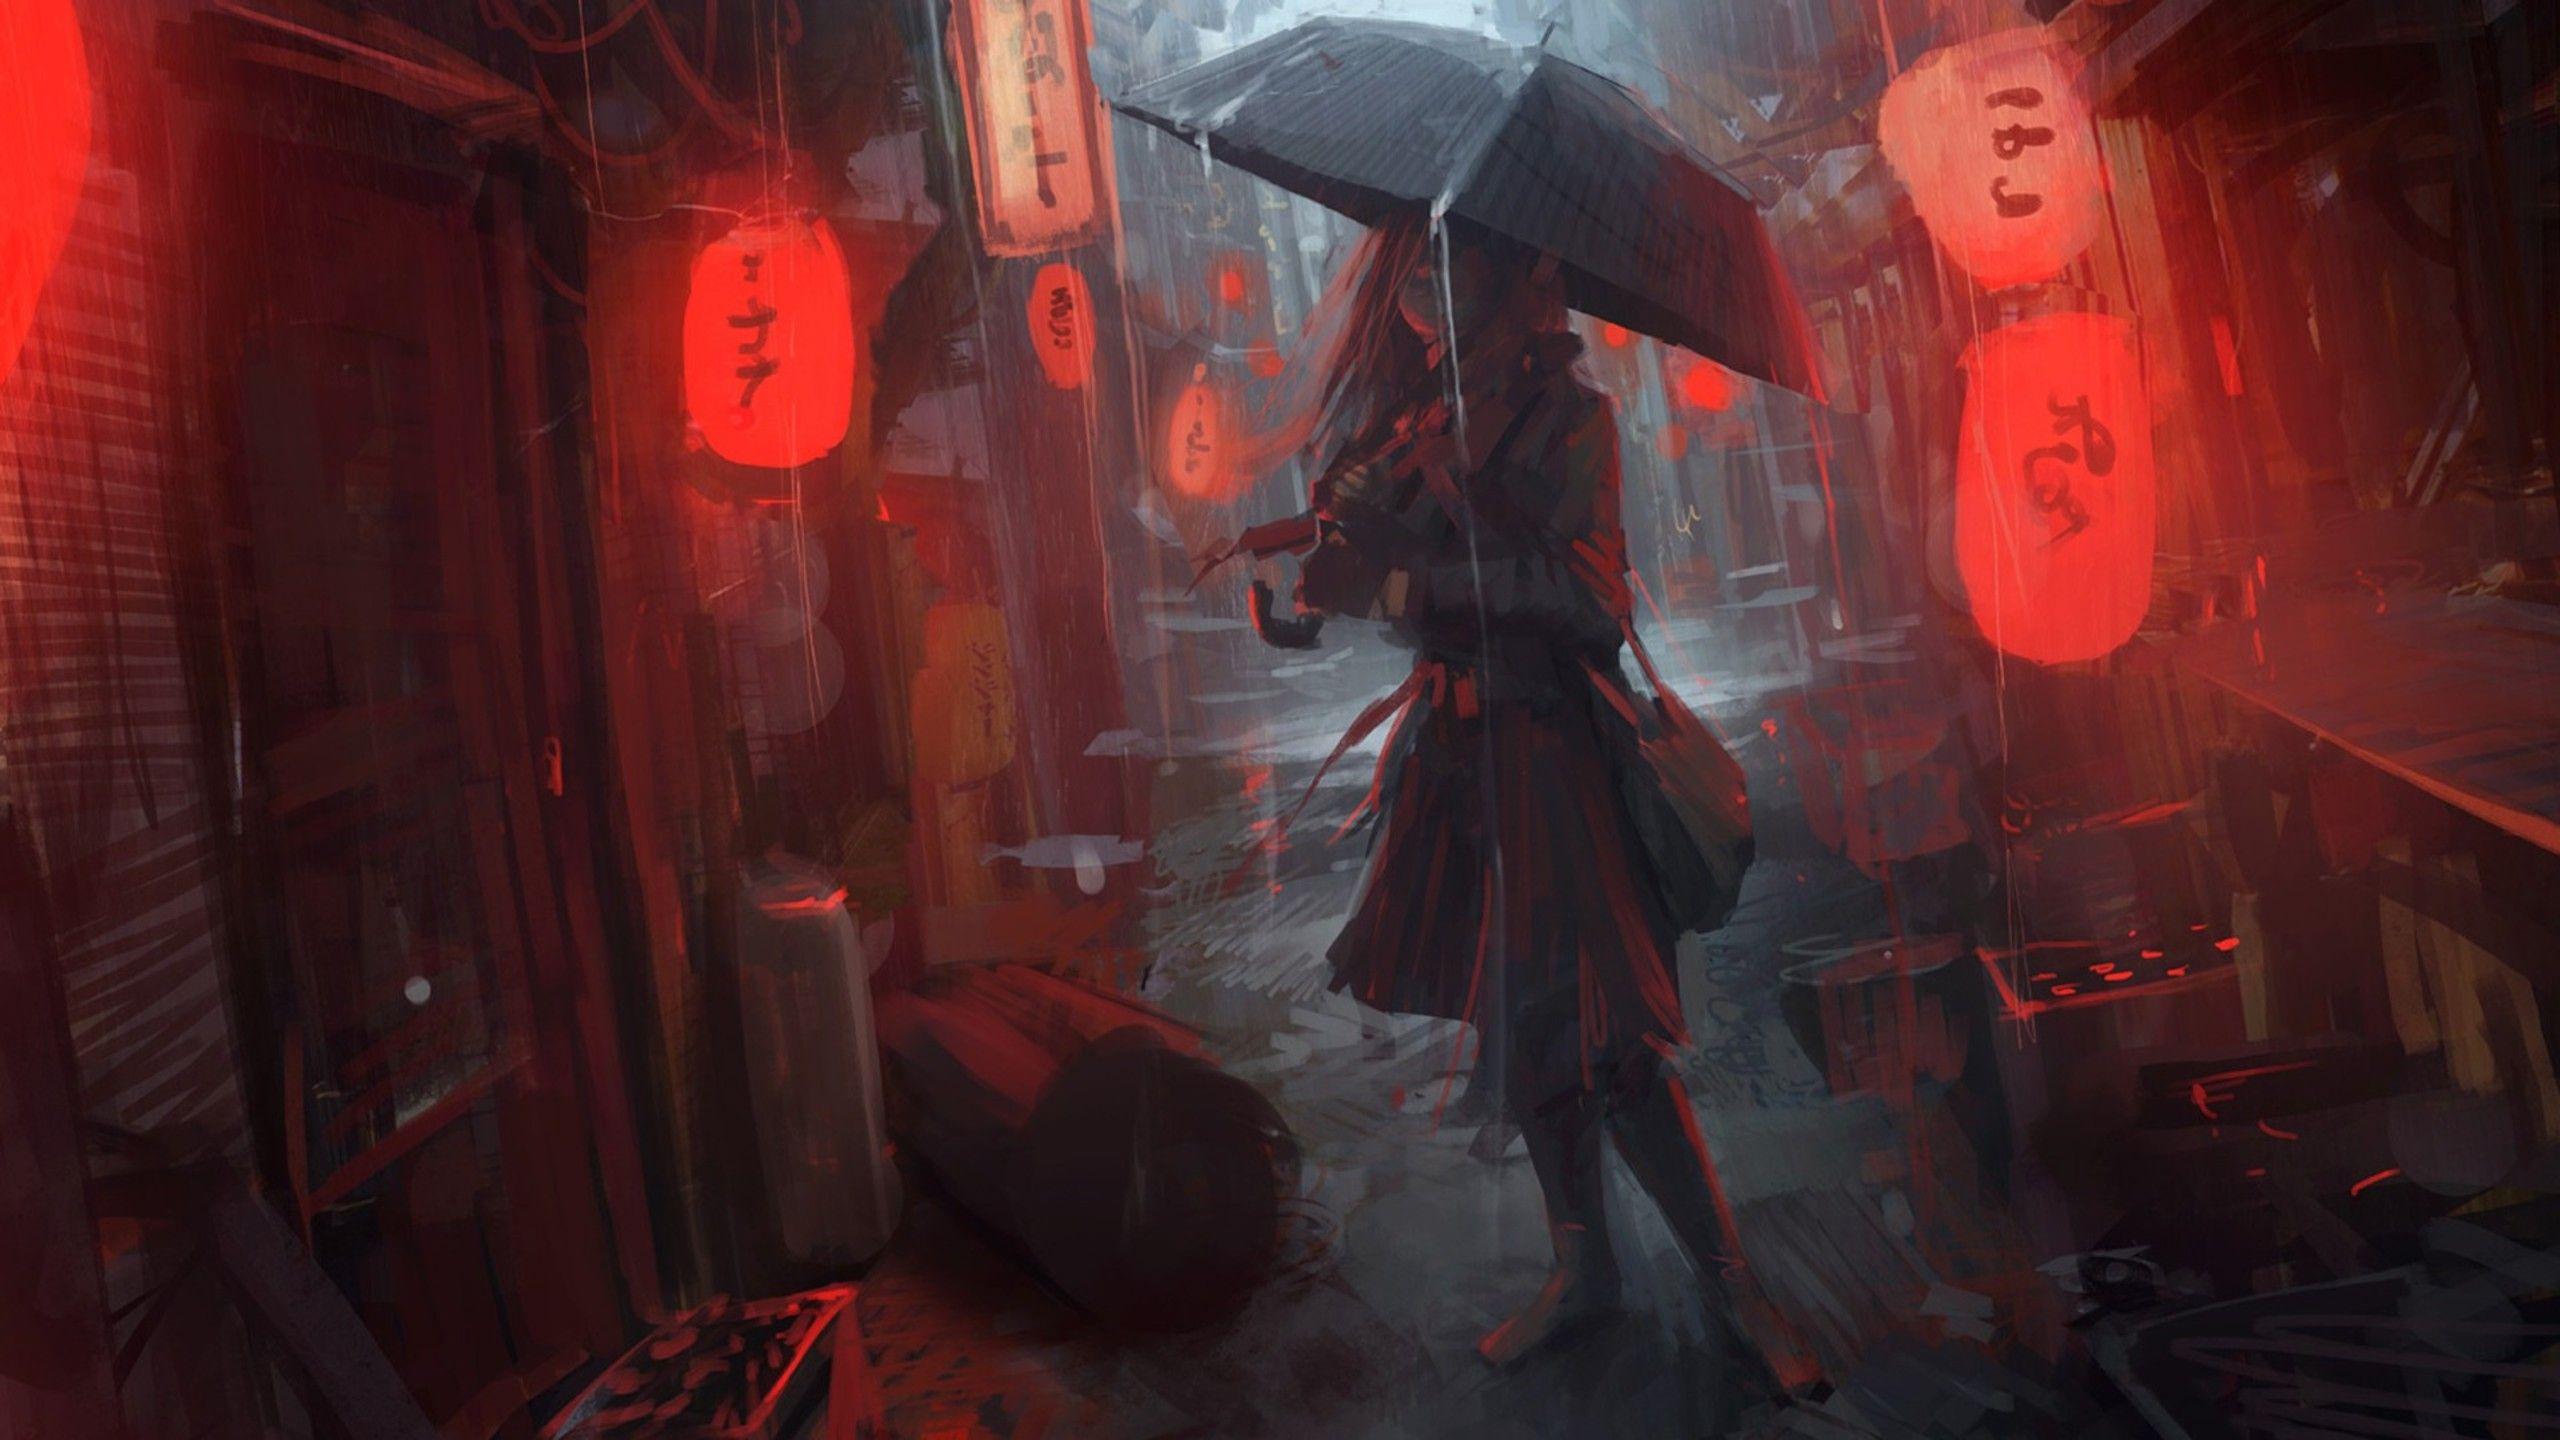 Anime Girl In Rain, HD Anime, 4k Wallpapers, Images ...